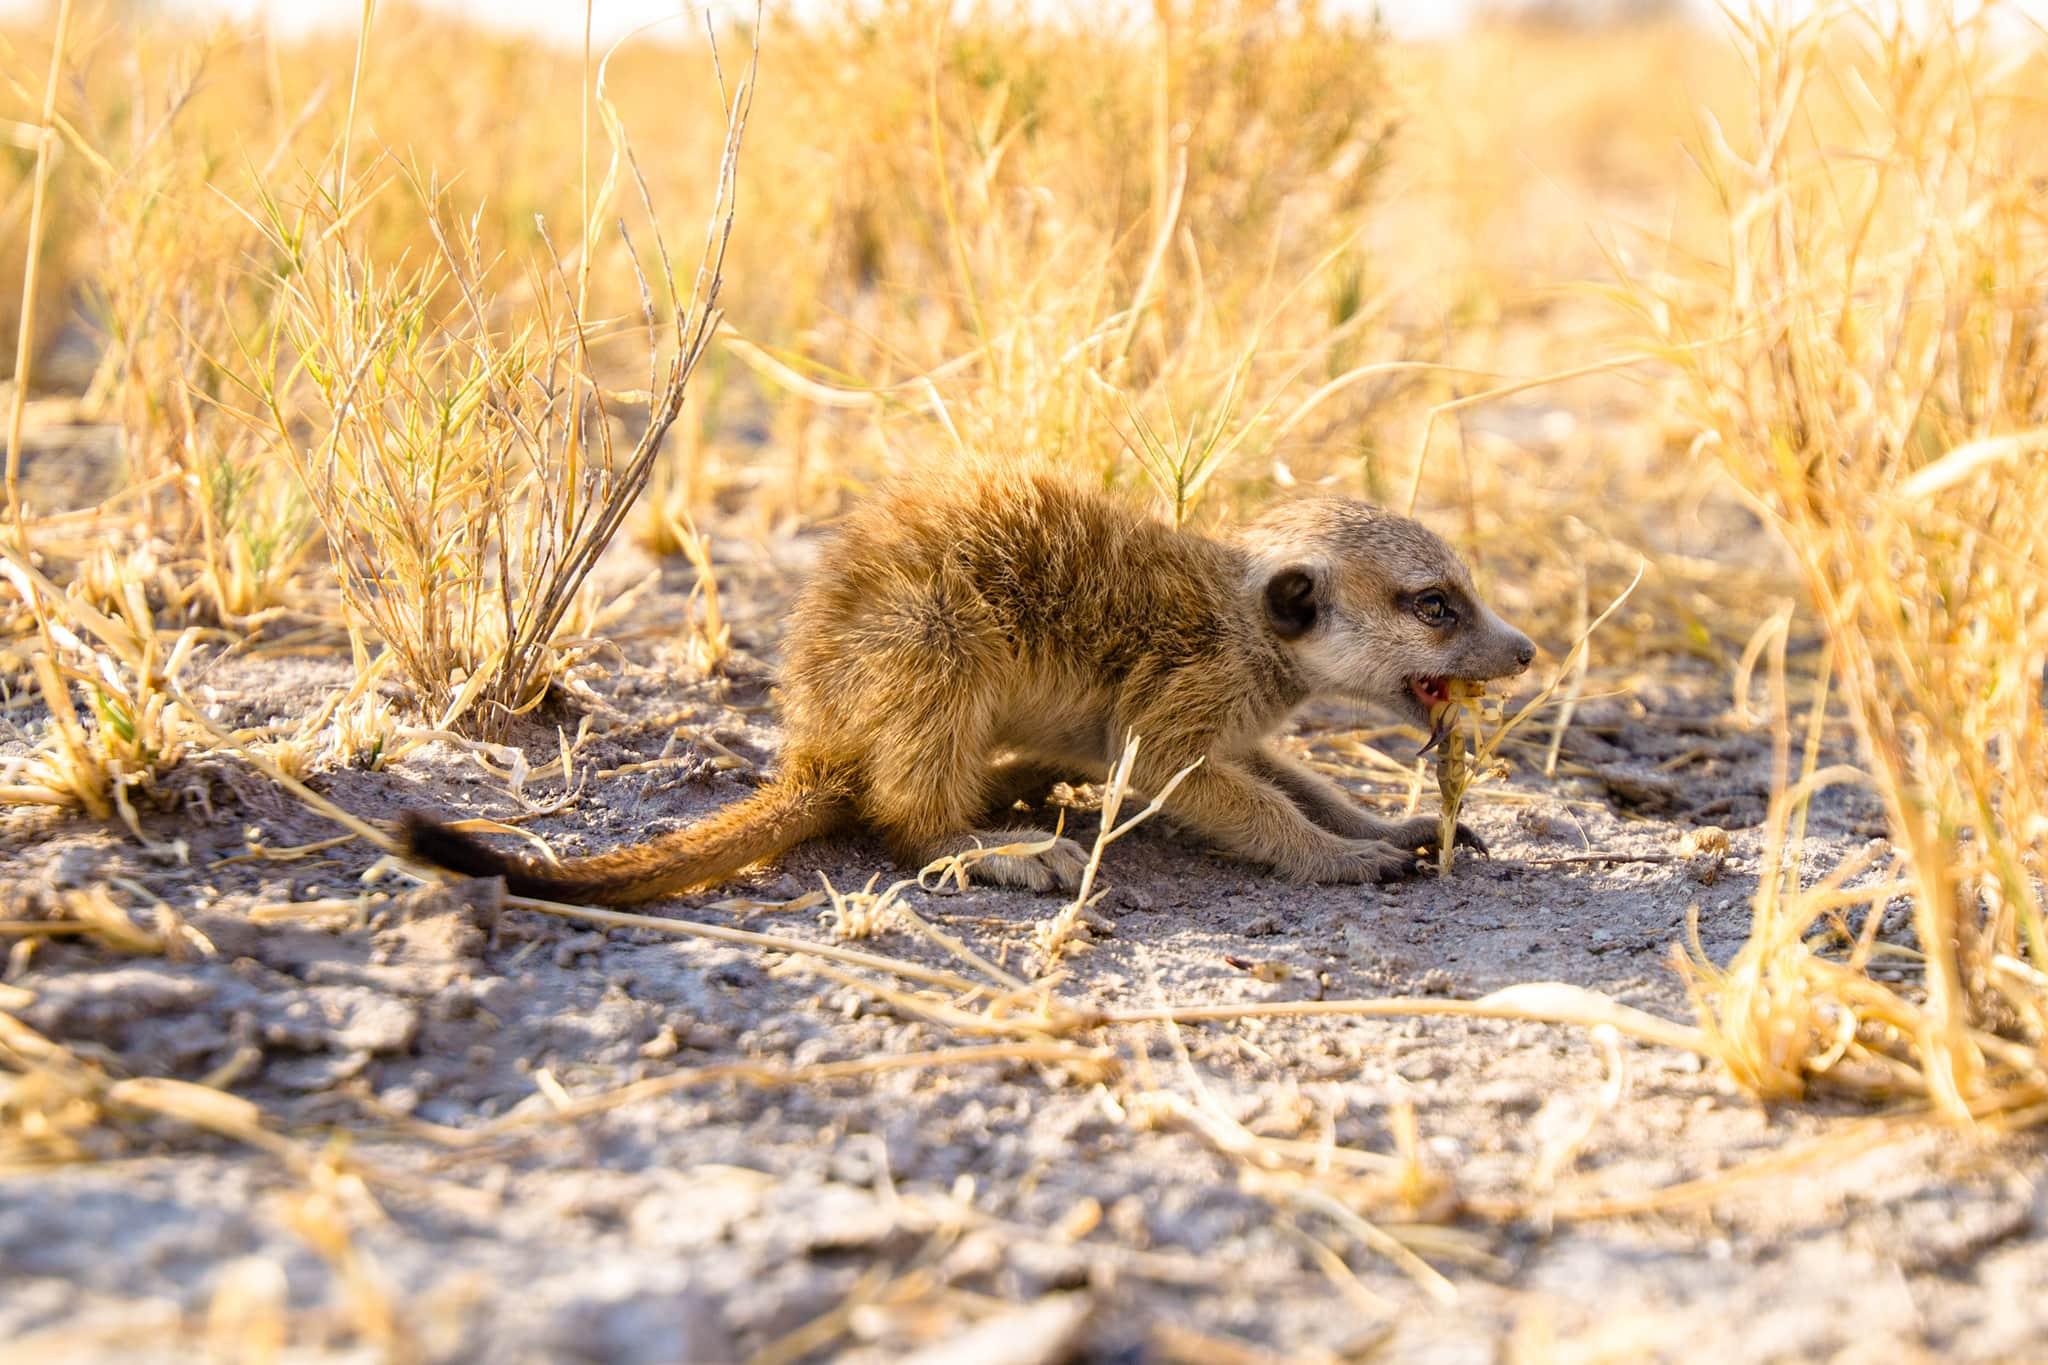 meerkat eating a scorpion in Jack's Camp Botswana